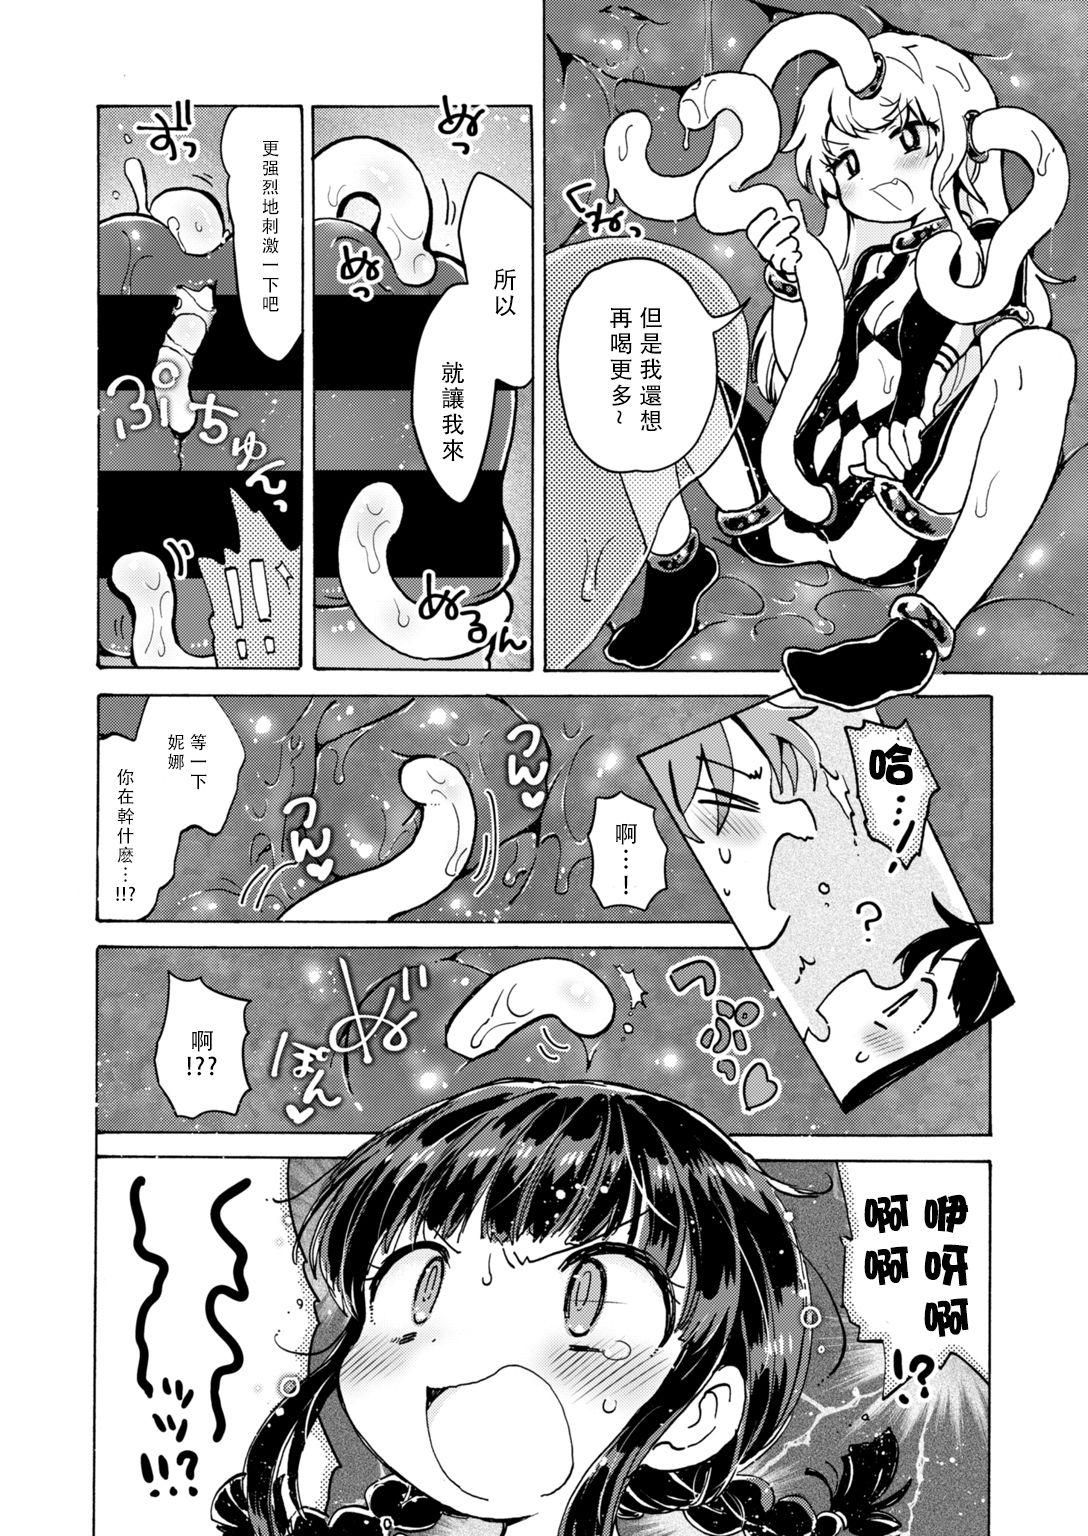 Chitsu no Naka kara Konnichiwa!! - Hello from the hole of love! 16